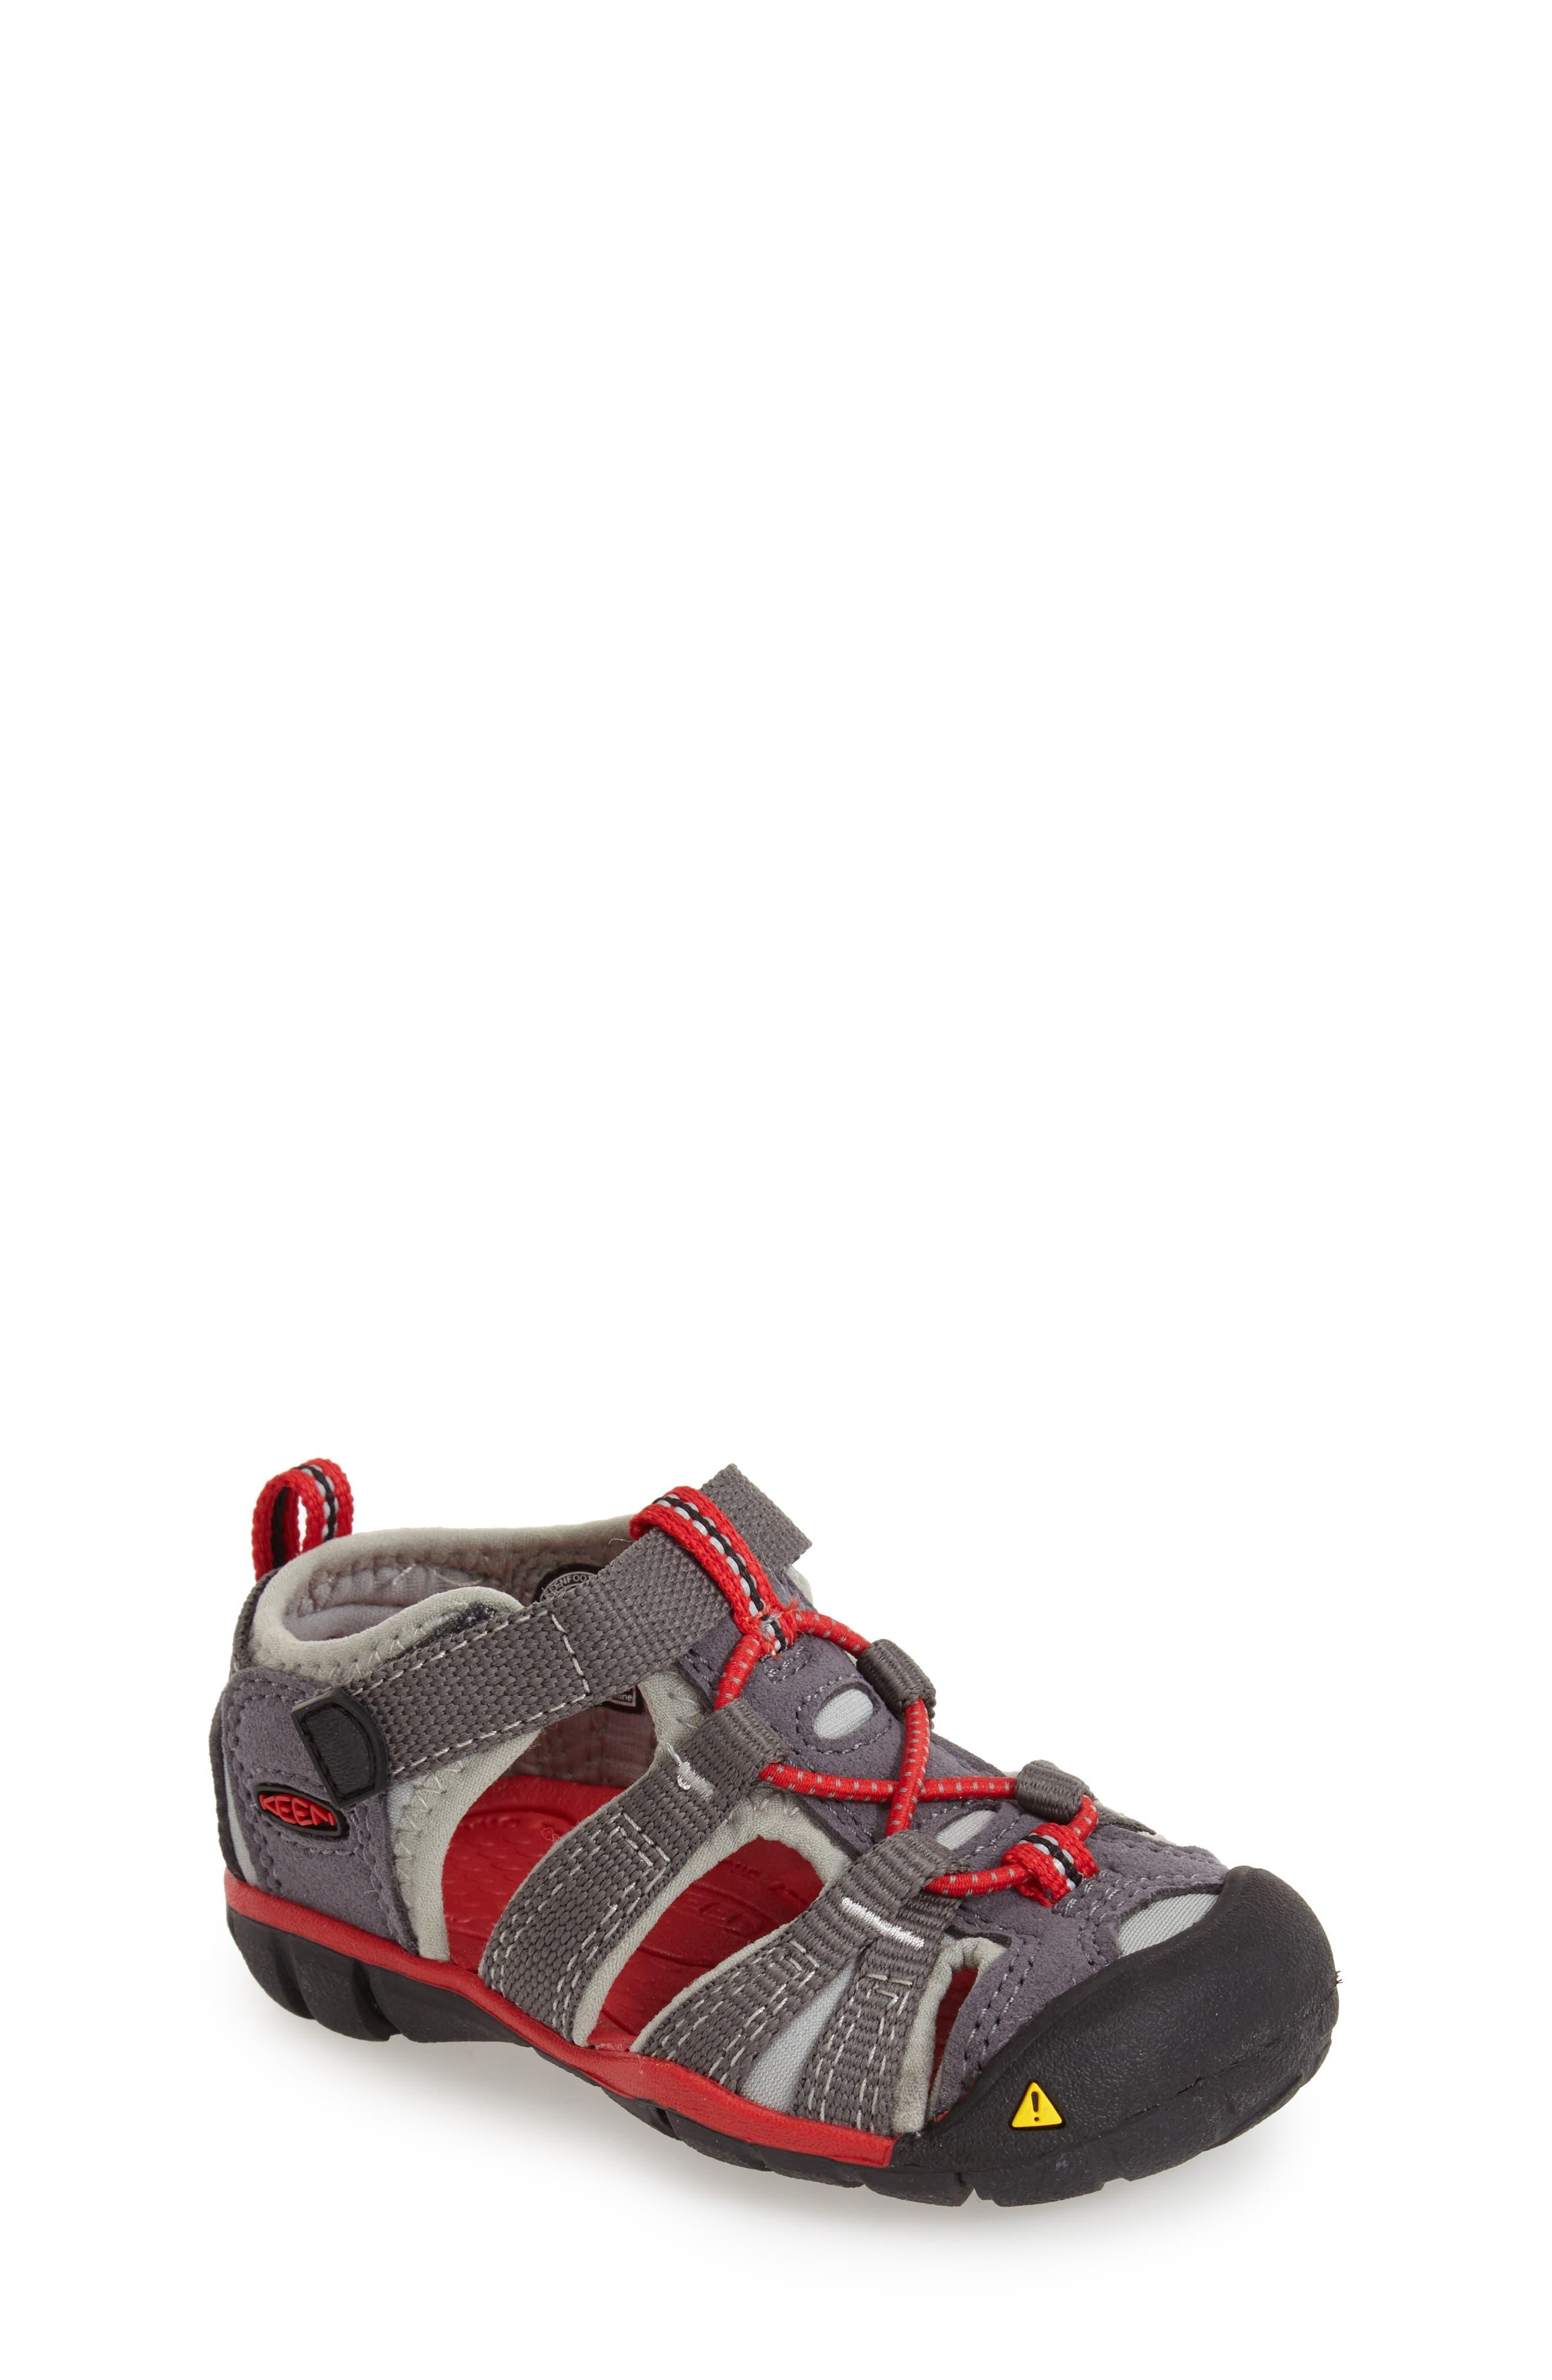 KEEN,                             Seacamp II Water Friendly Sandal,                             Main thumbnail 1, color,                             025